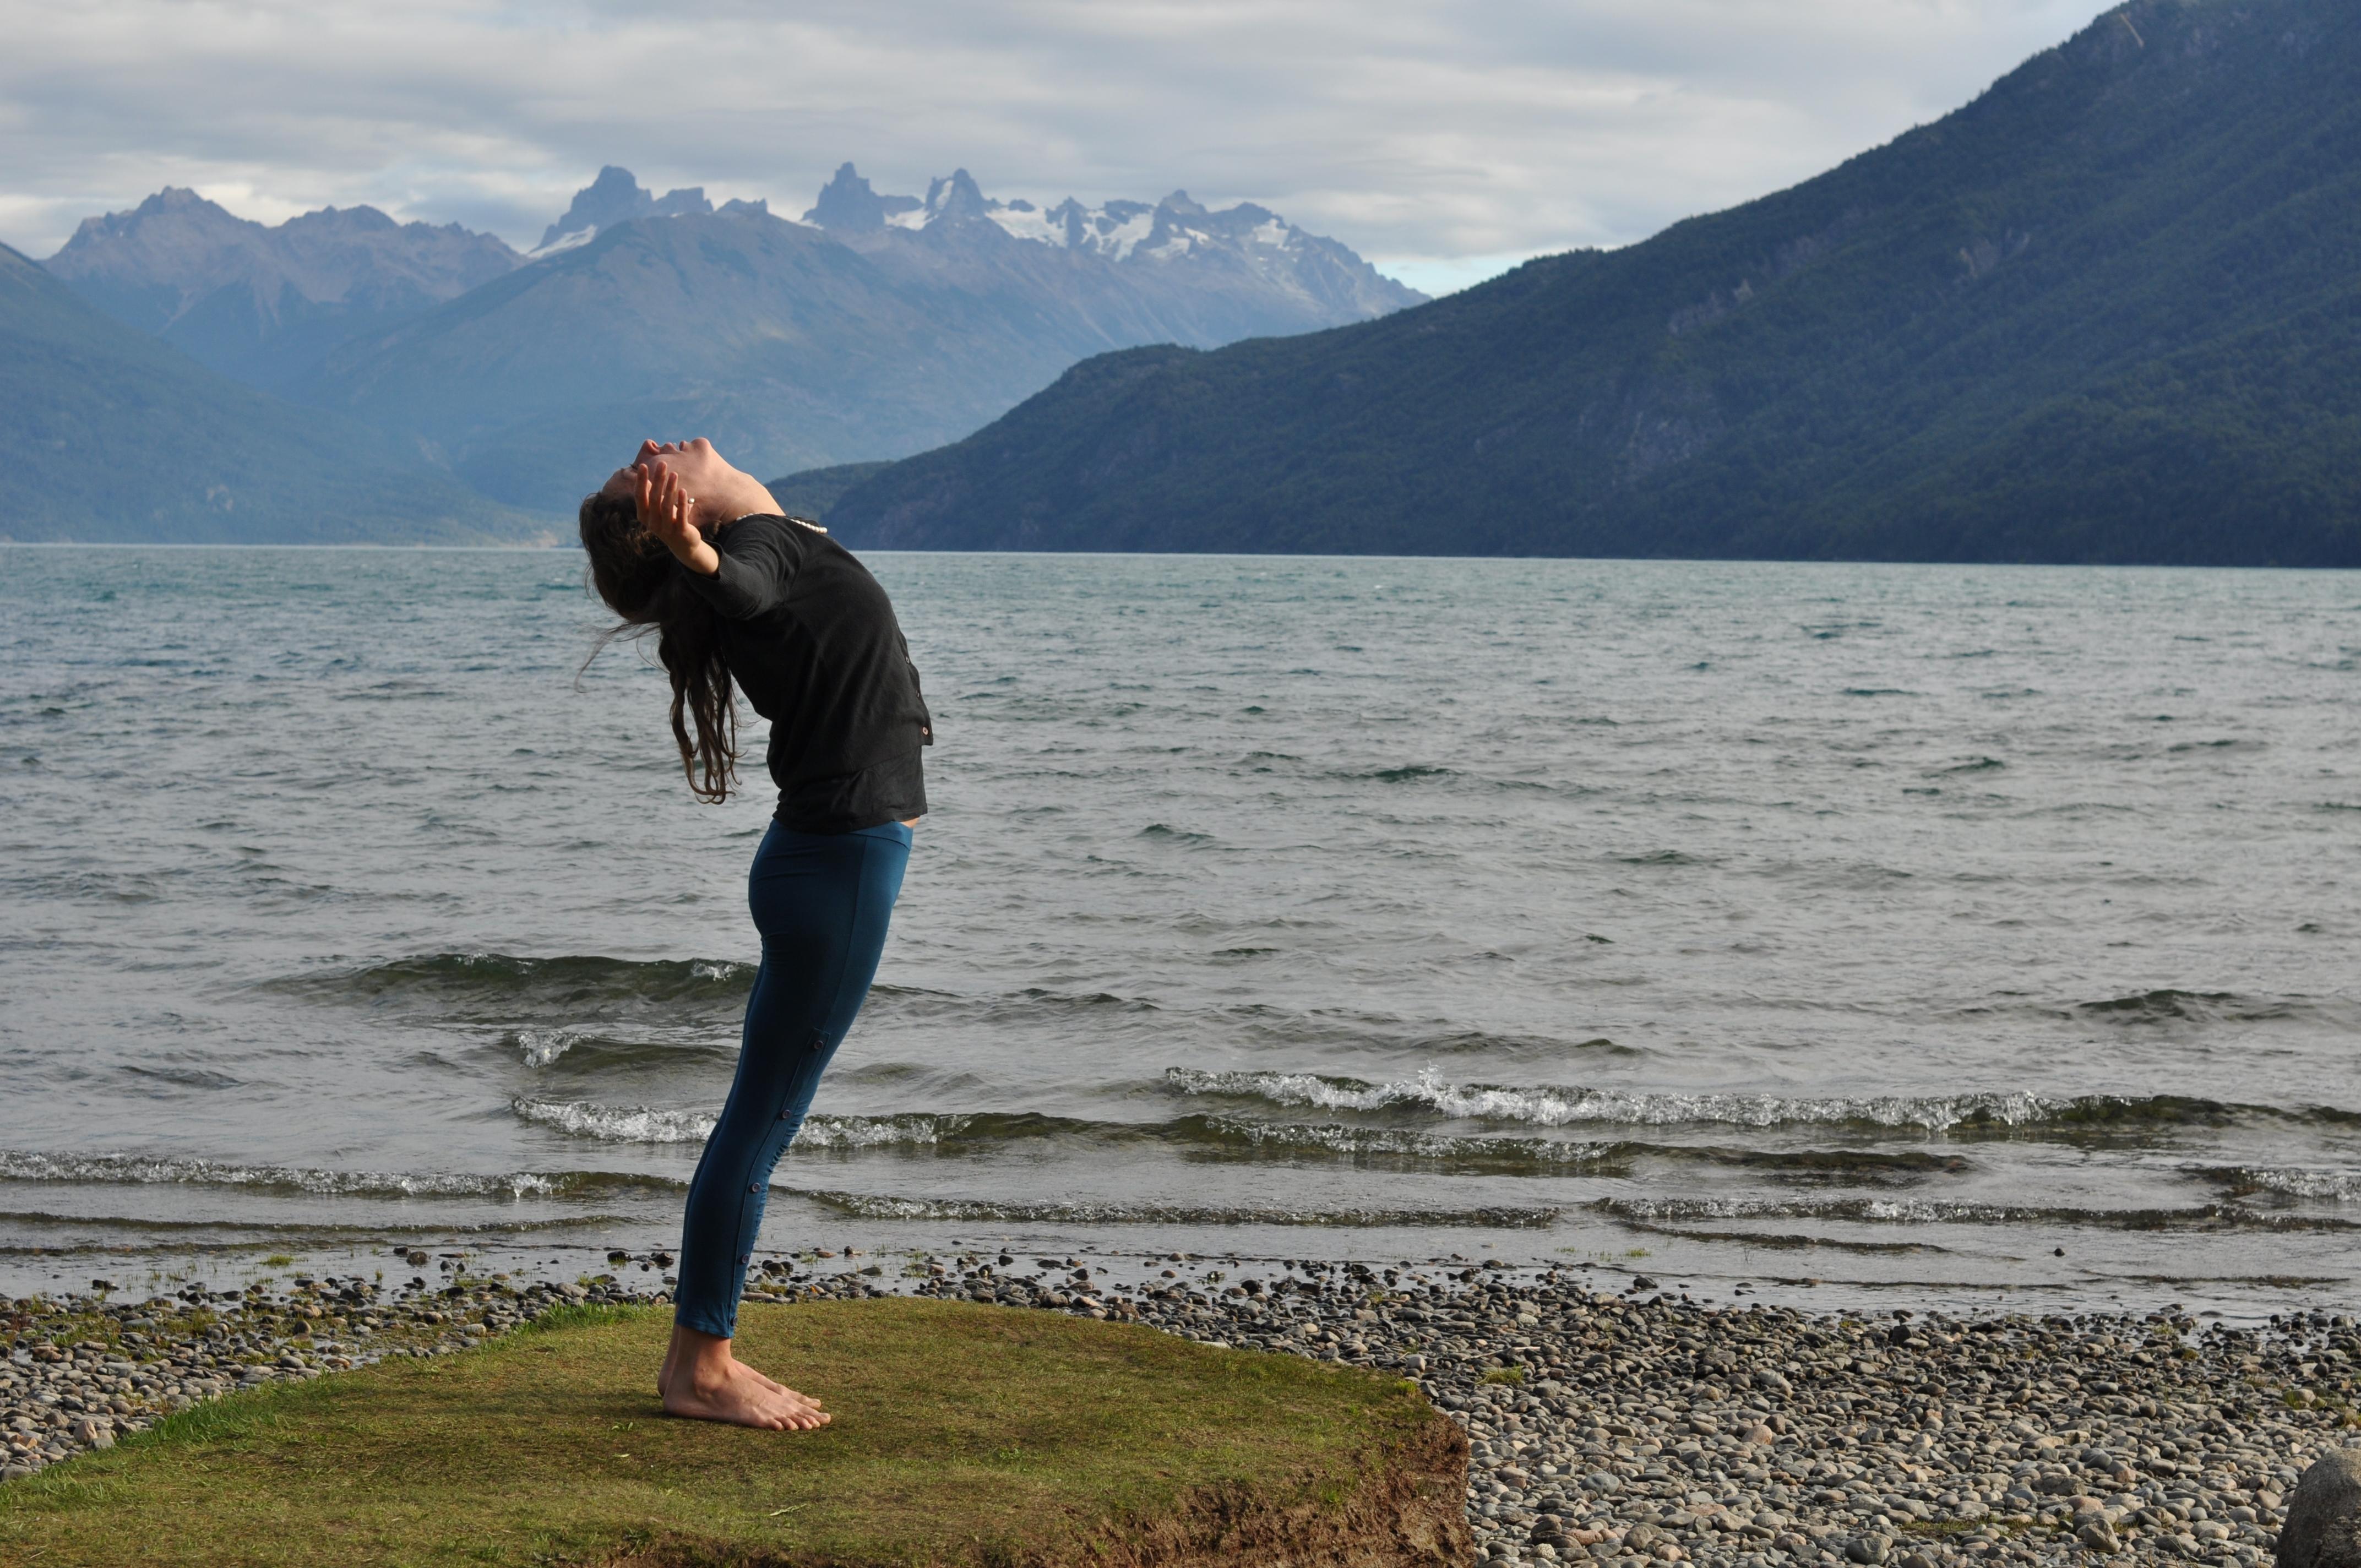 2012_03_13+Chloe++Yoga+Lago+Puelo+(10).JPG